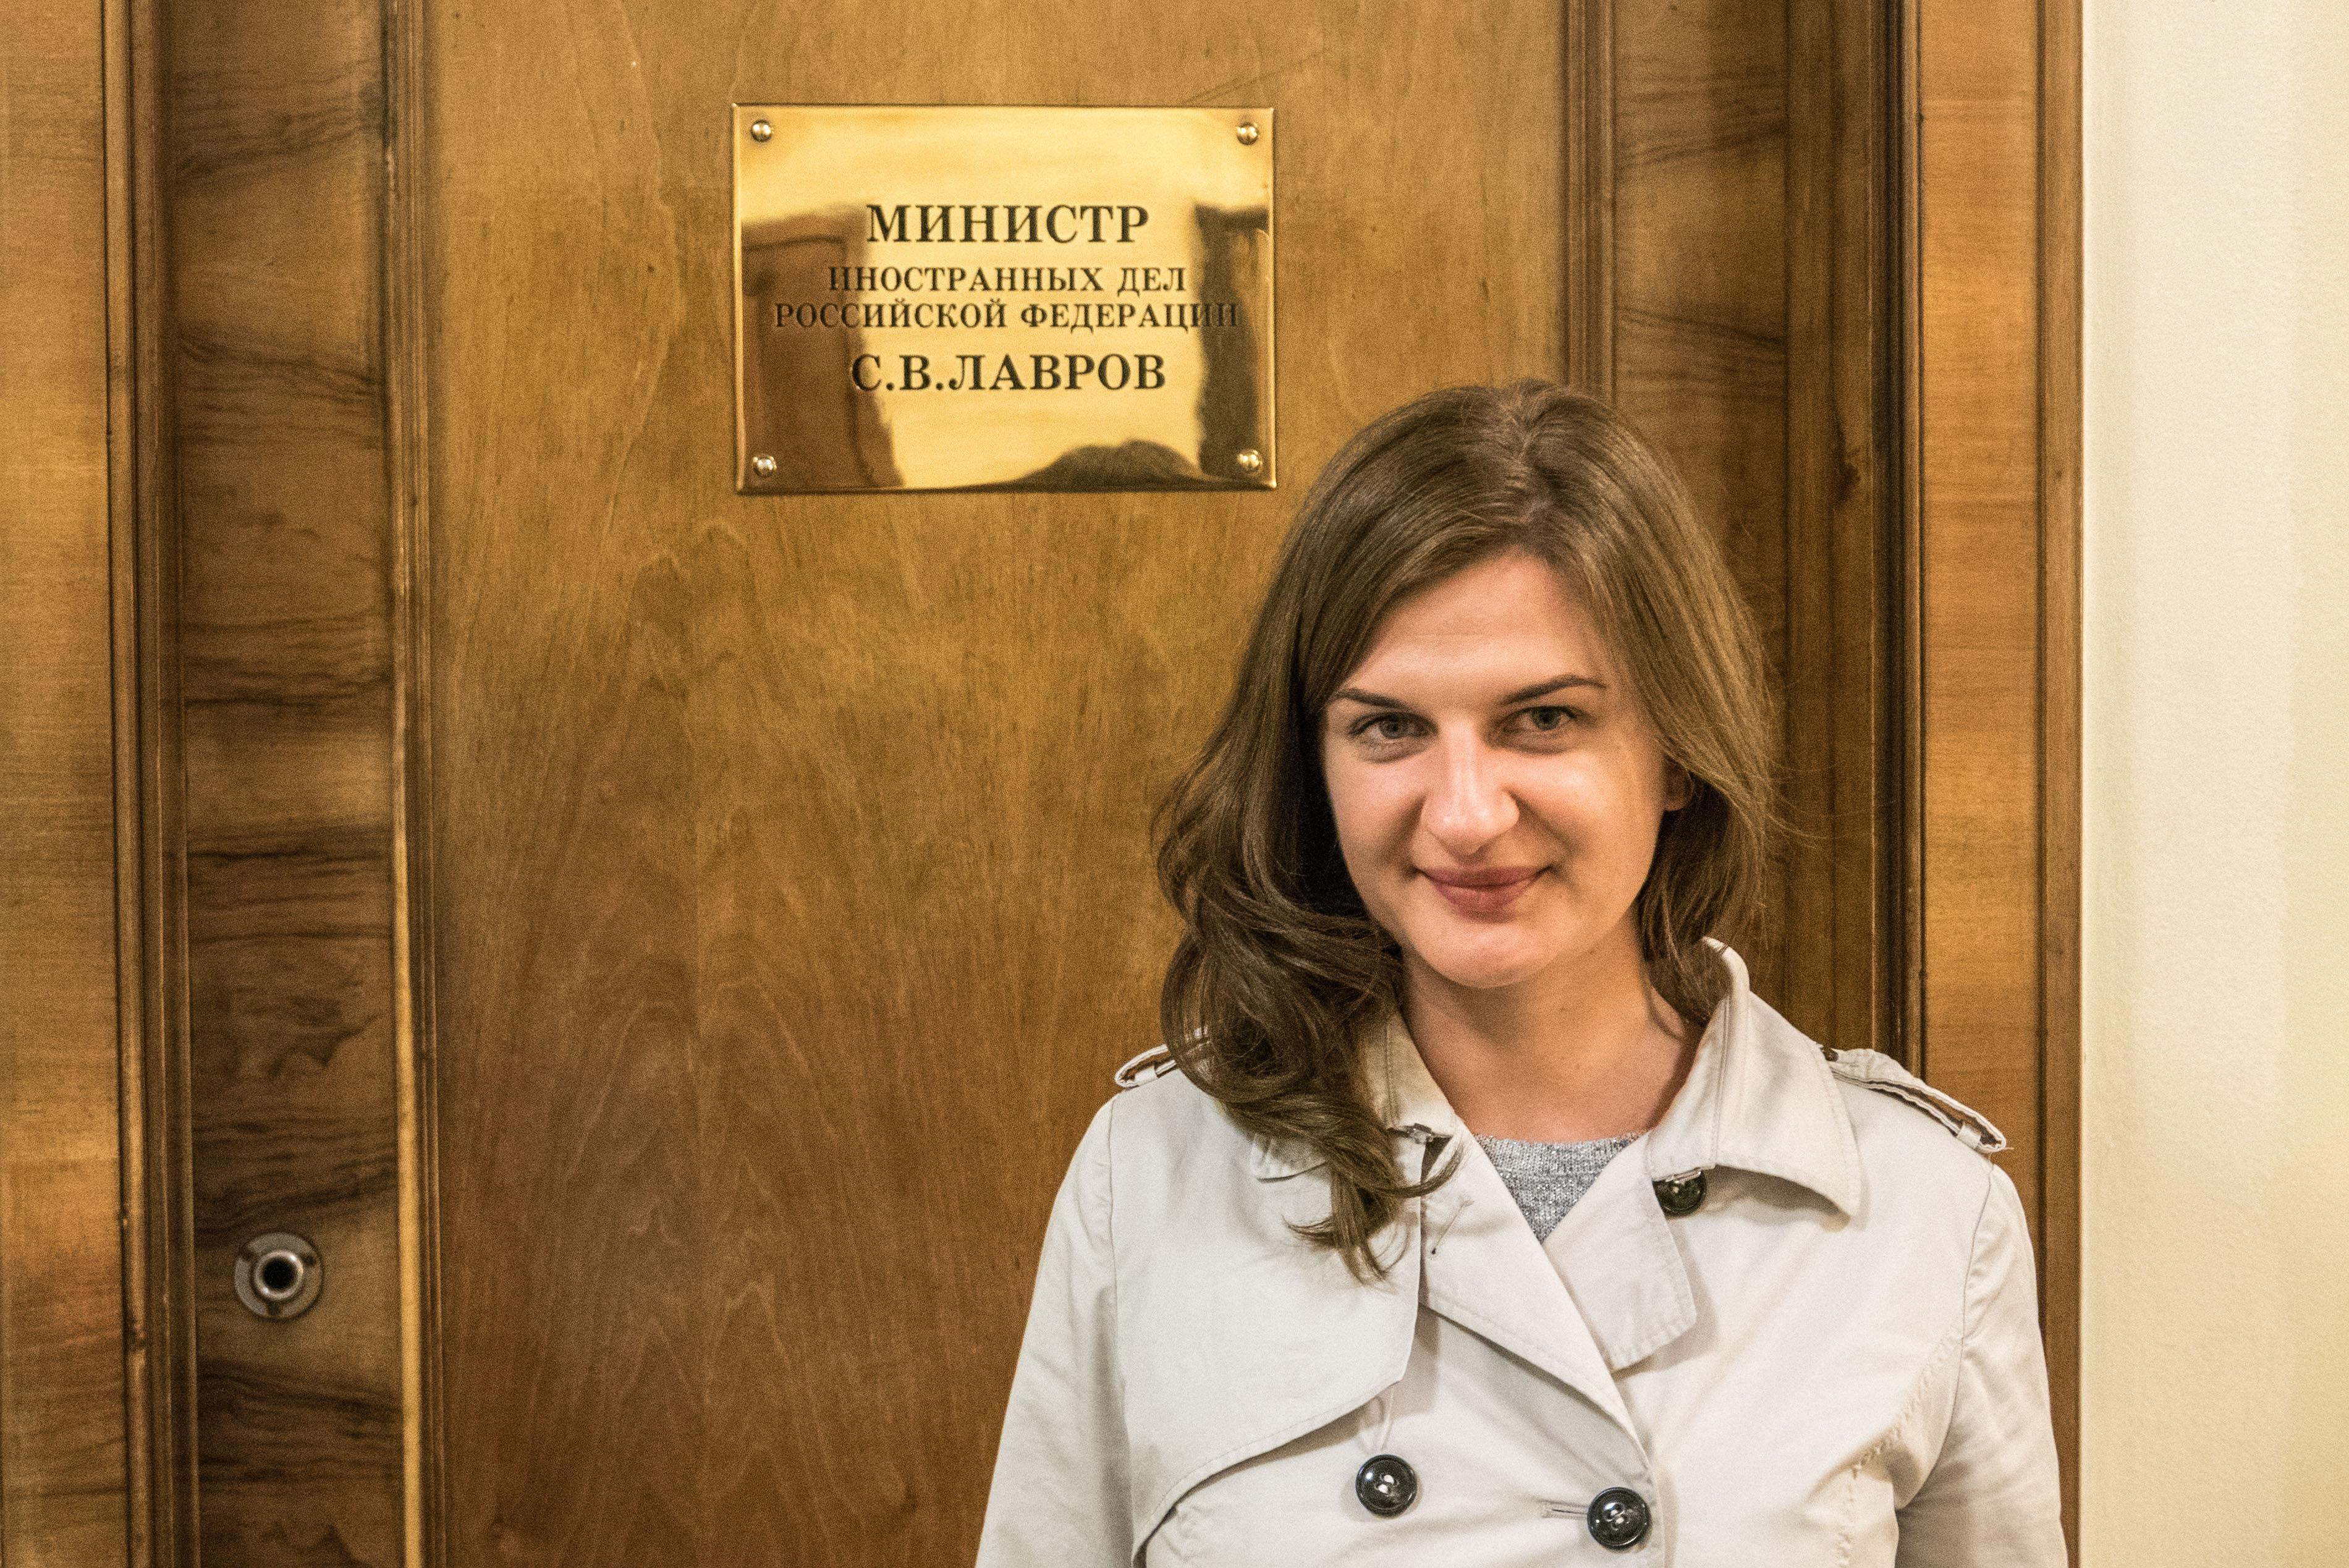 Polska dziennikarka Agnieszka Piwar w MSZ Rosji. Moskwa.